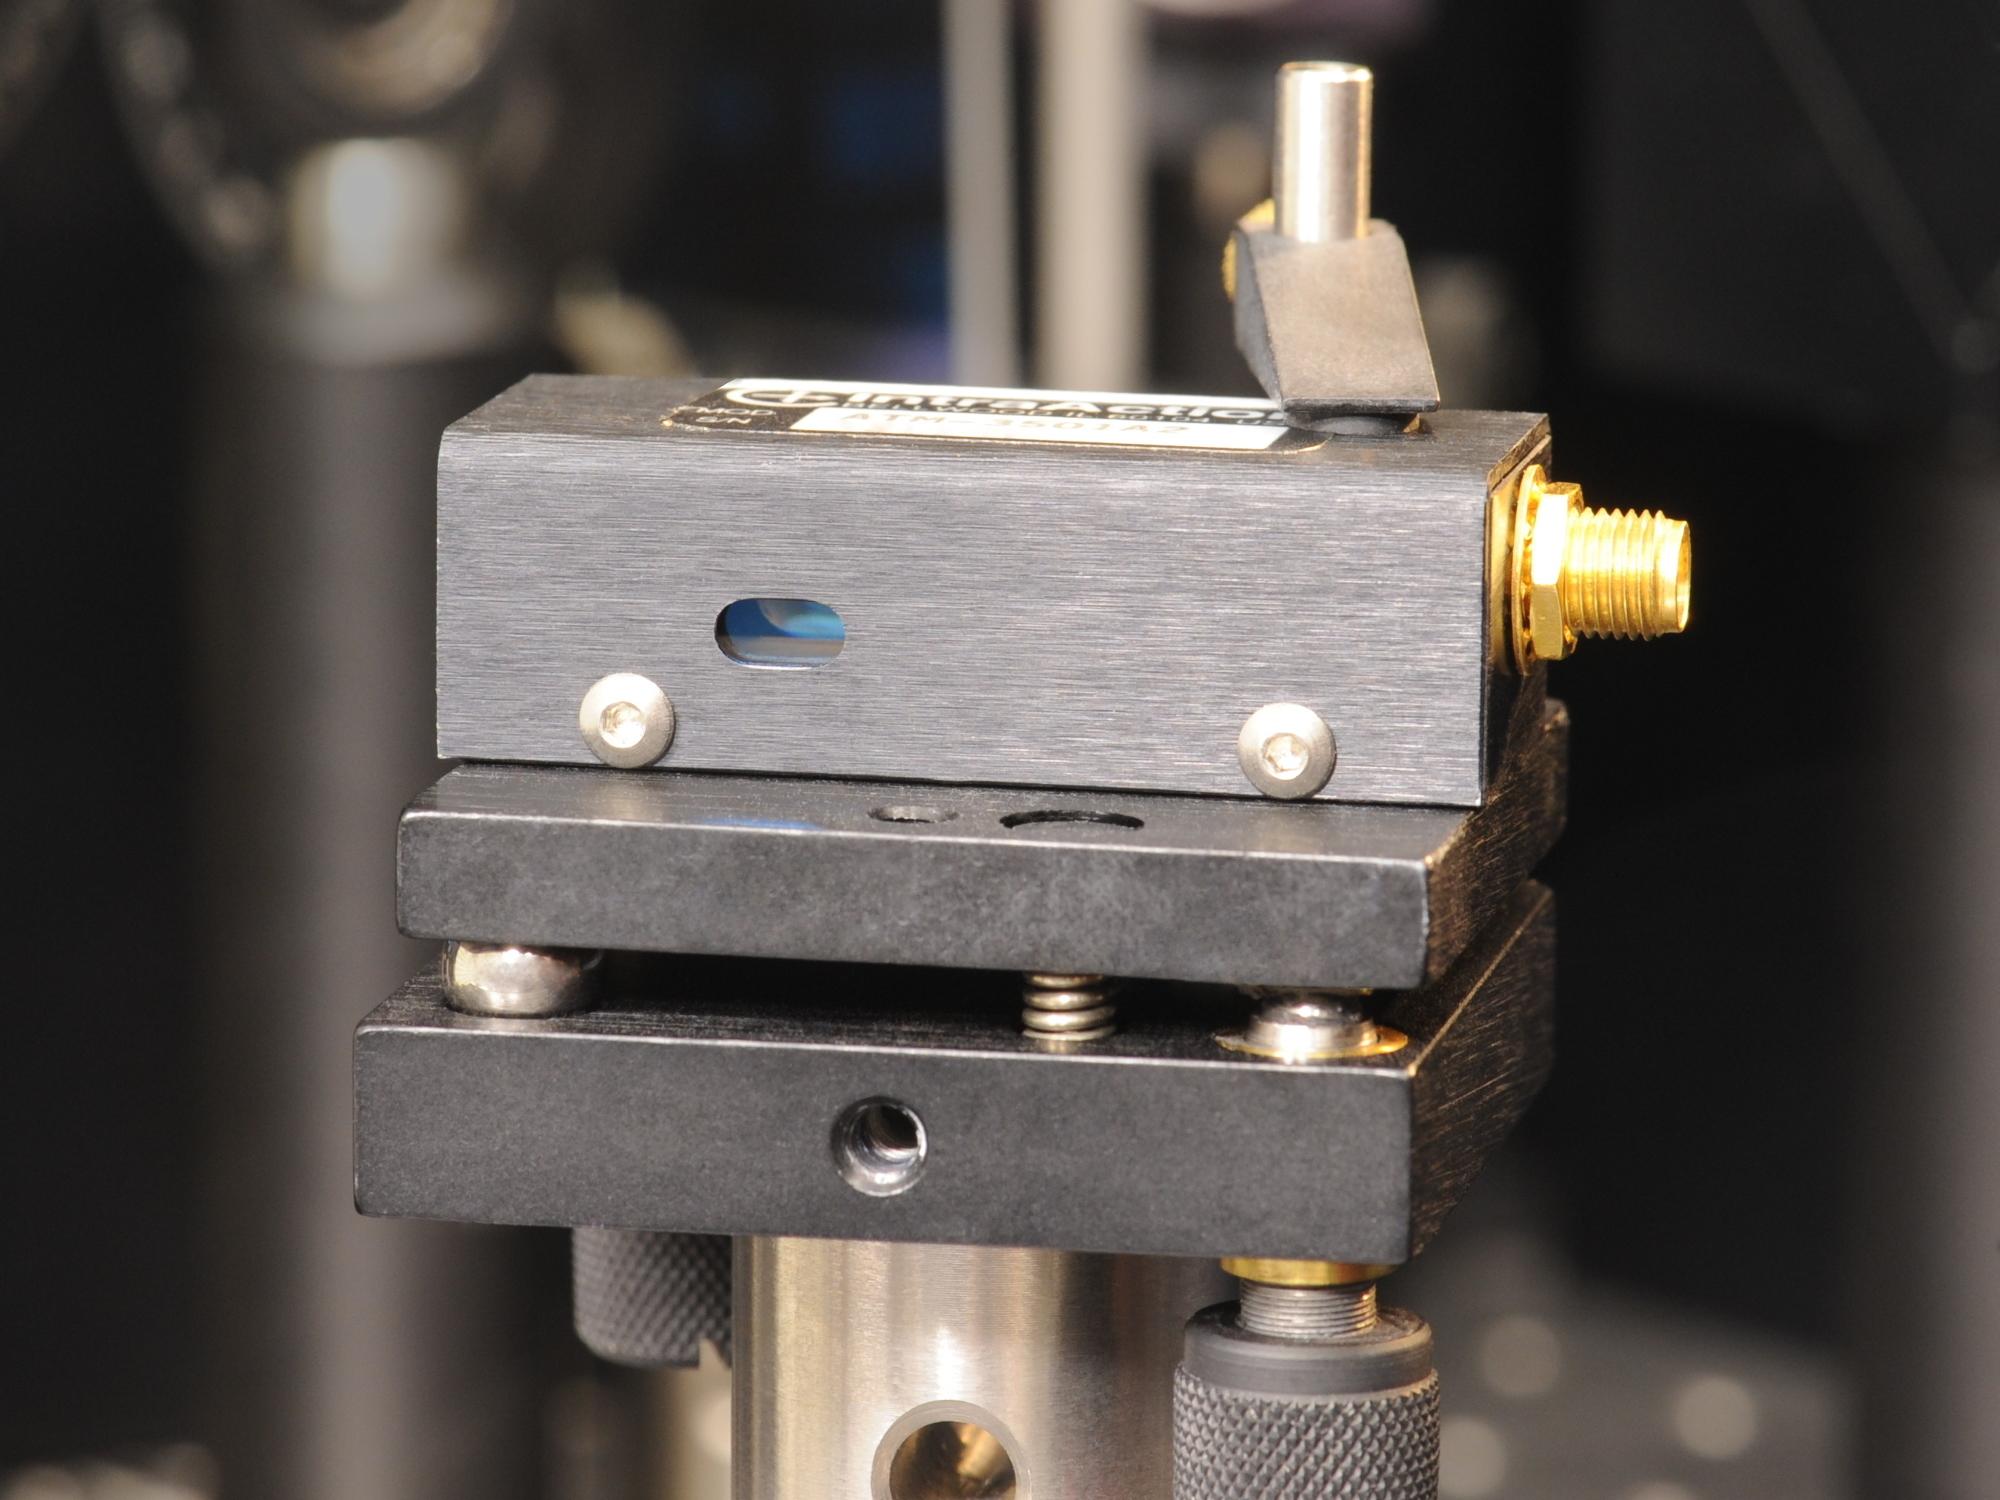 File:Acousto-optic-modulator-ATM-3501A2 2.jpg - Wikimedia Commons